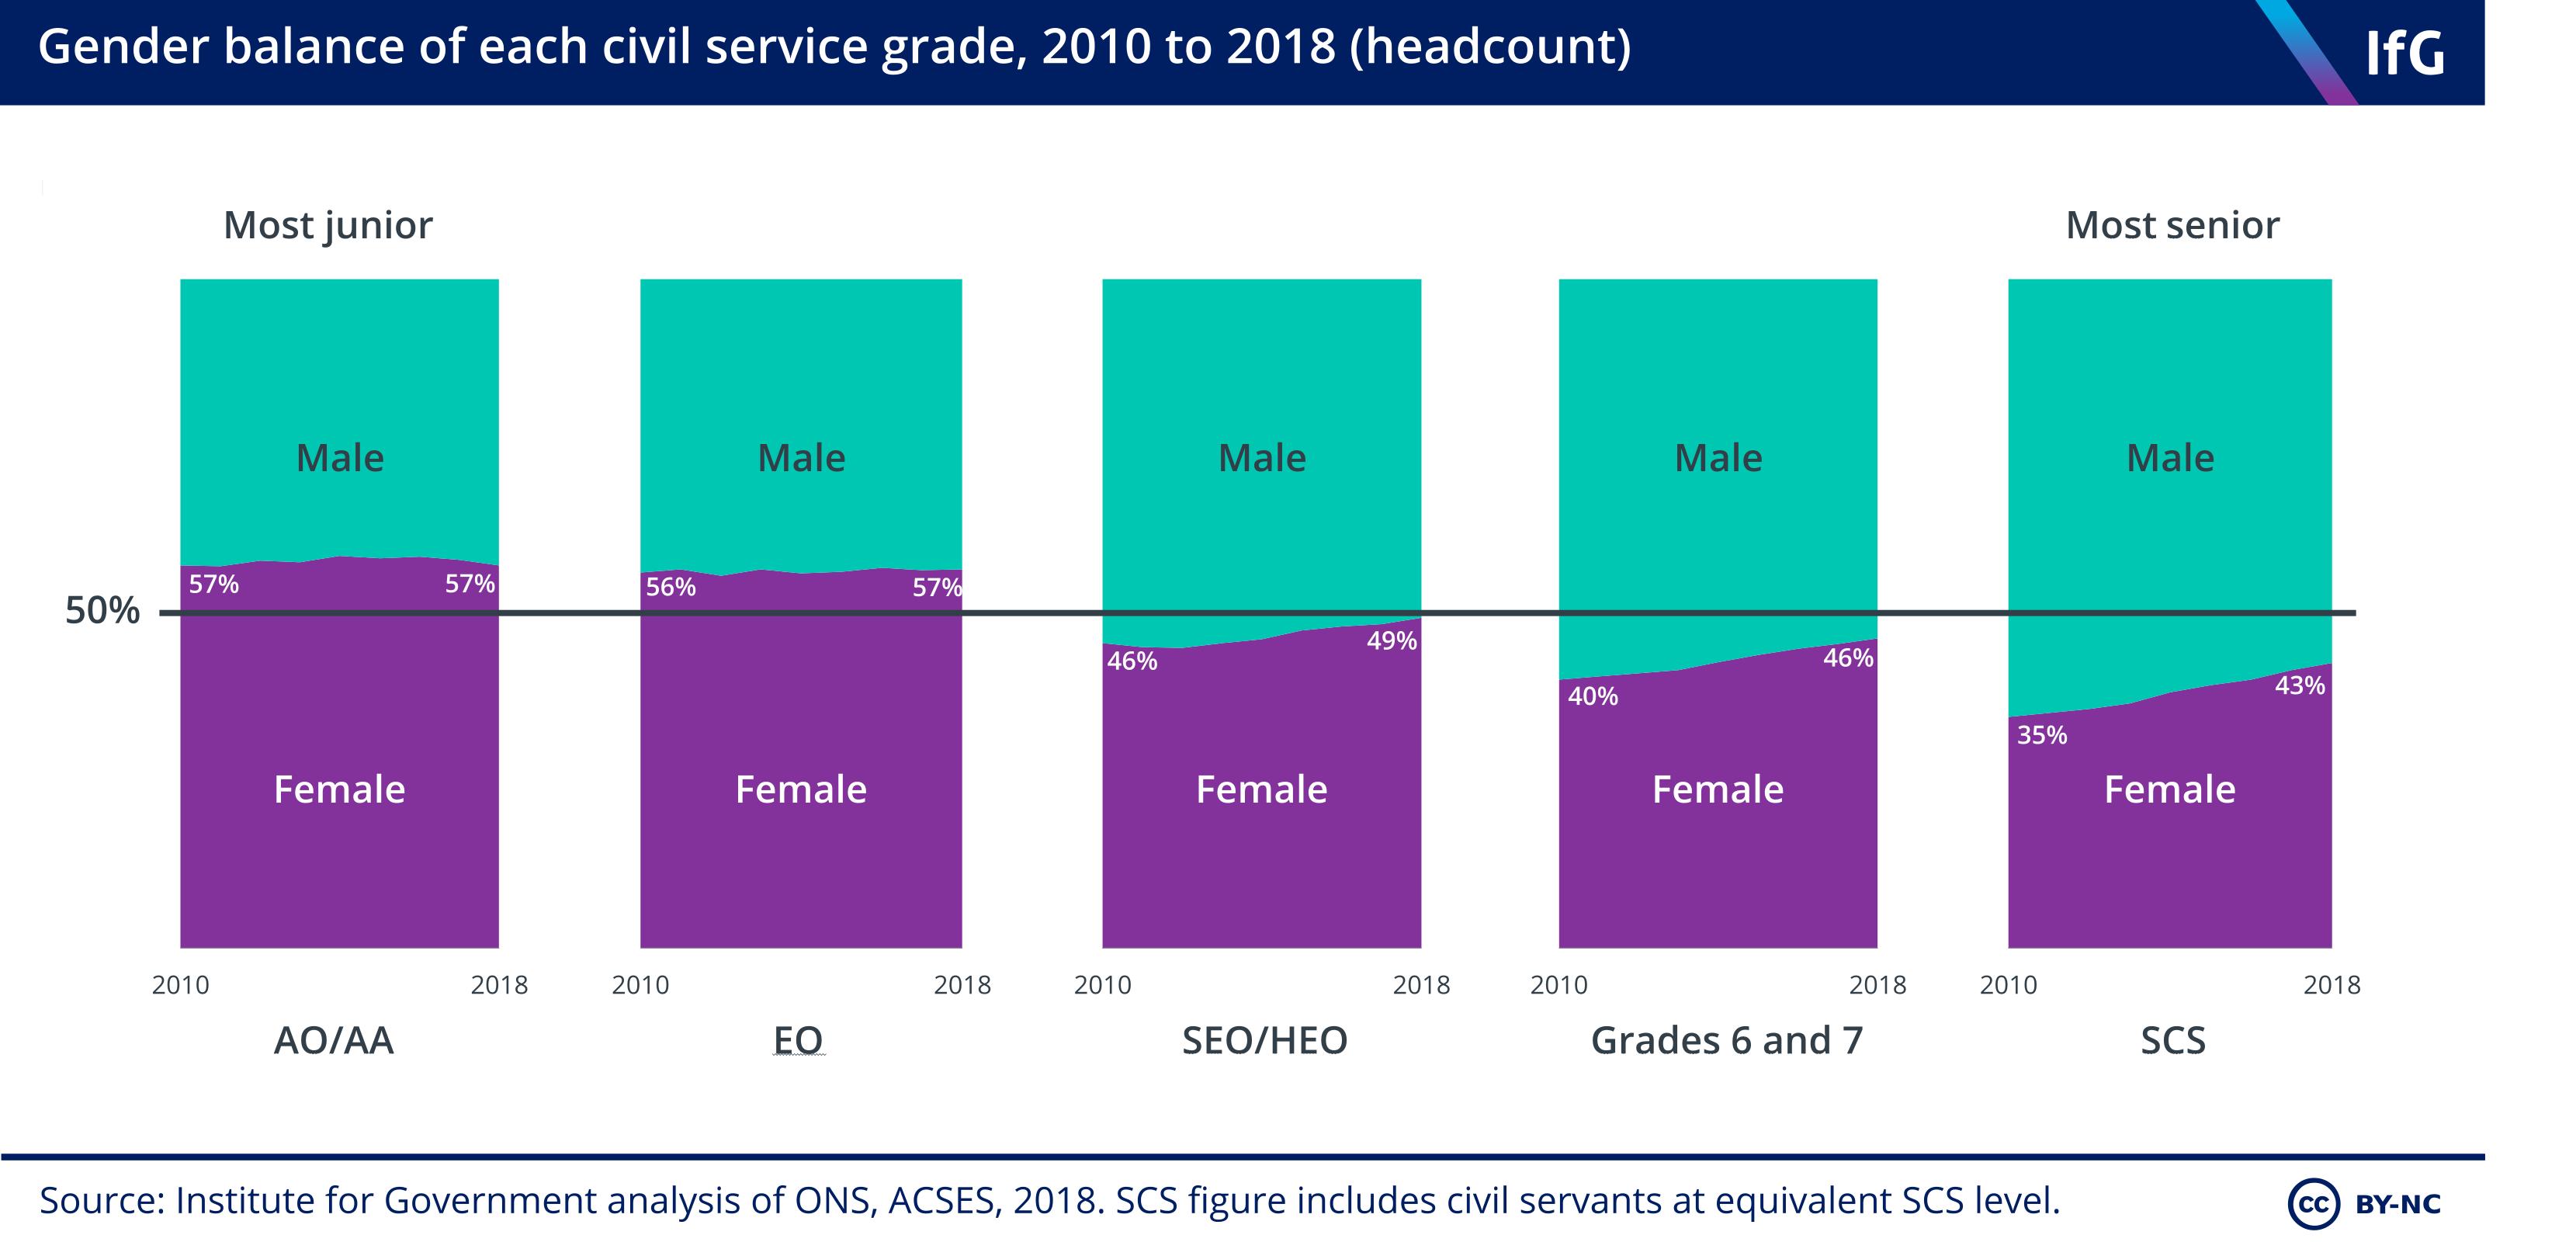 Civil service gender balance by grade 2010-2018